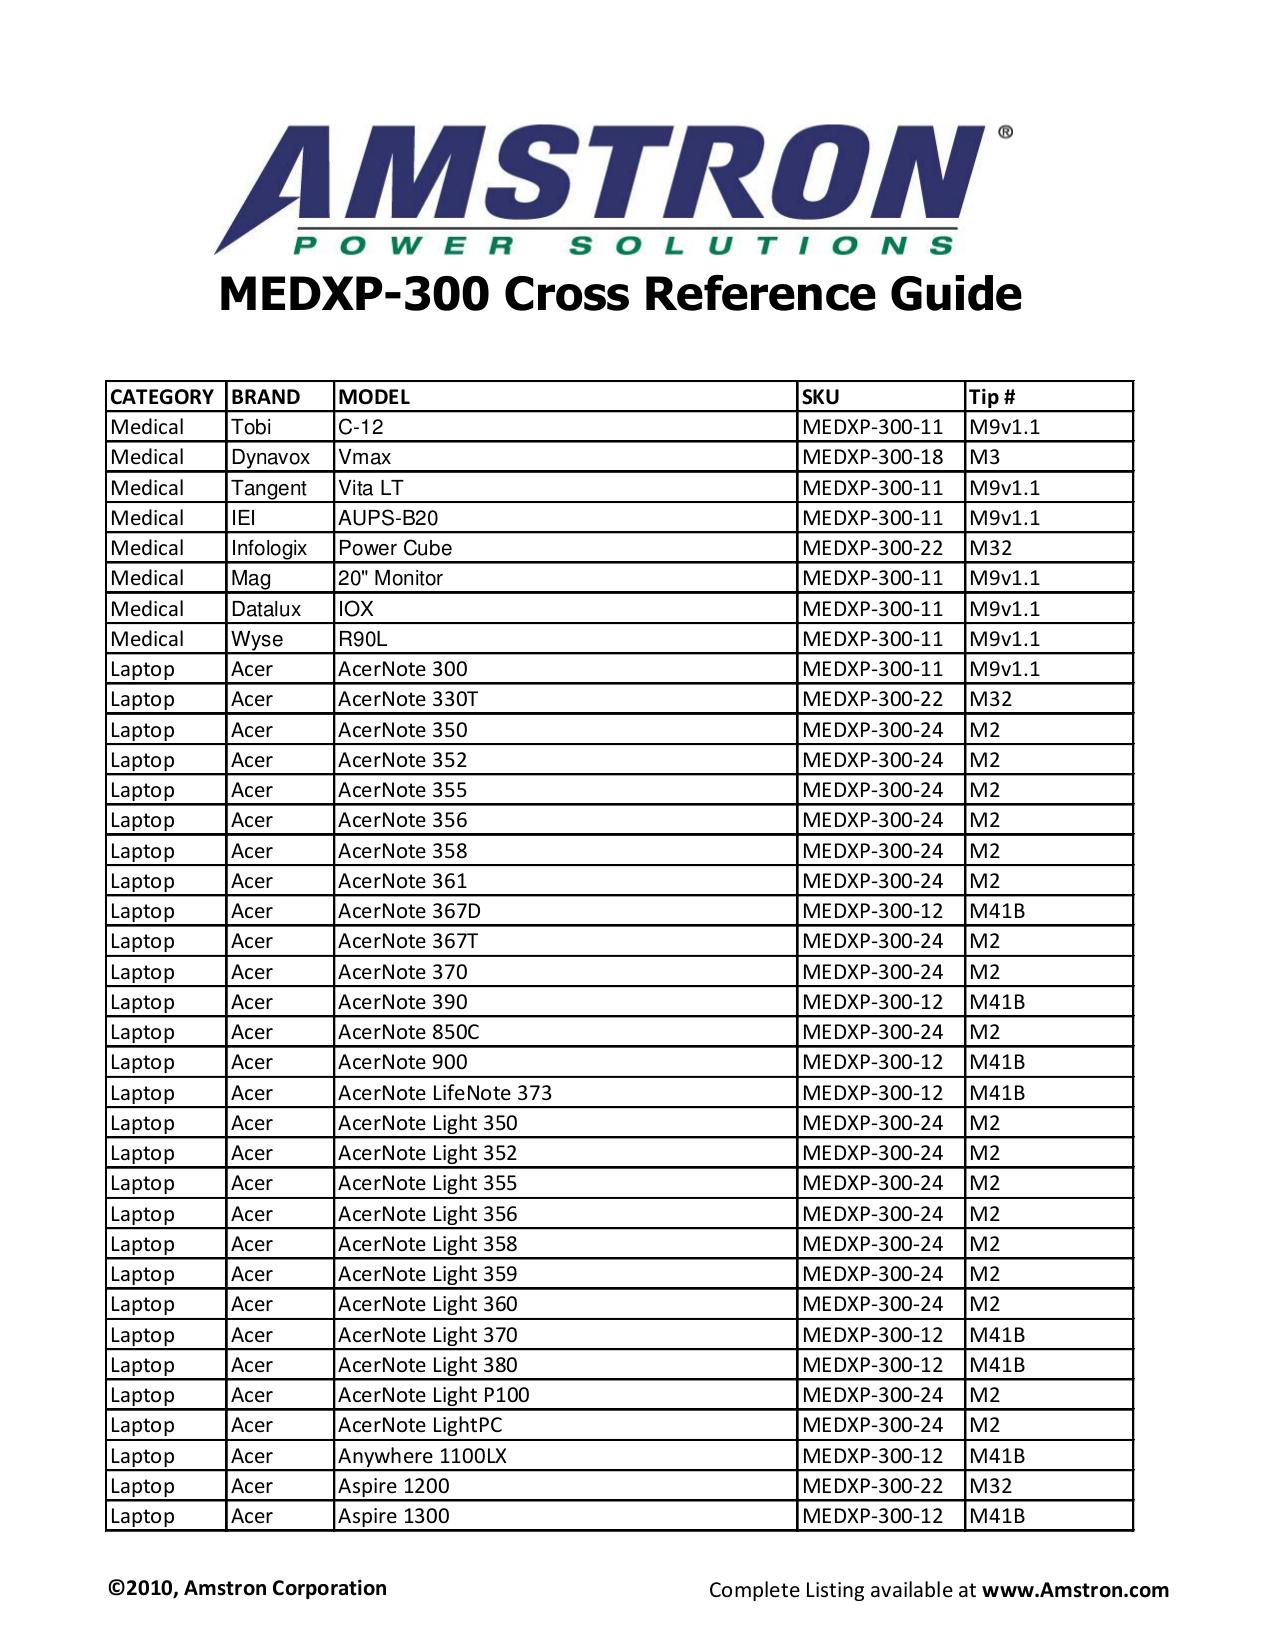 lenovo yoga 300 manual pdf